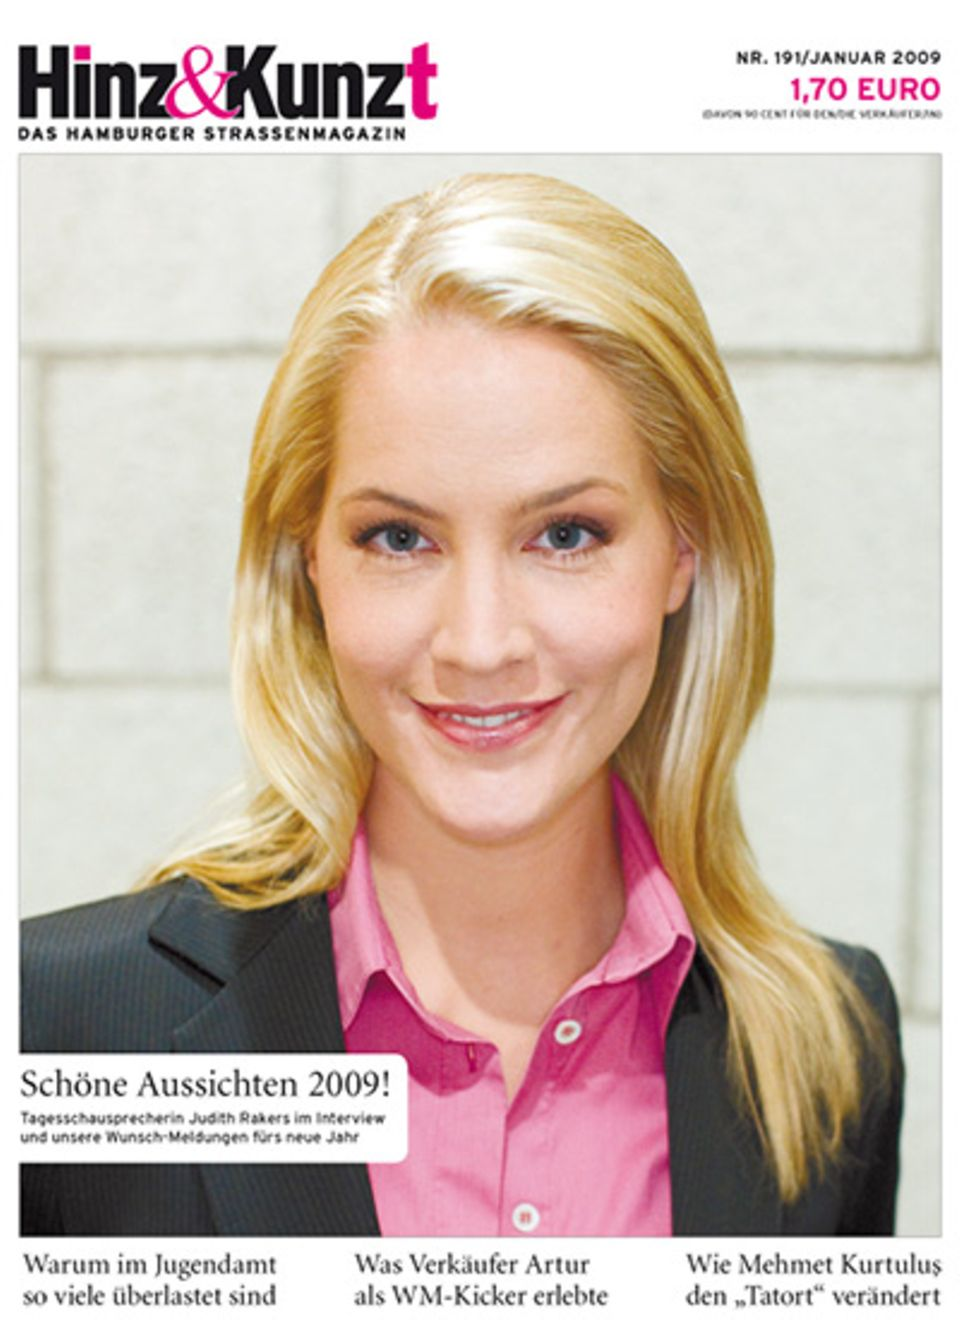 "Tageschausprecherin Judith Rakers ziert das Cover des hamburger Straßenmagazins ""Hinz und Kunzt"""